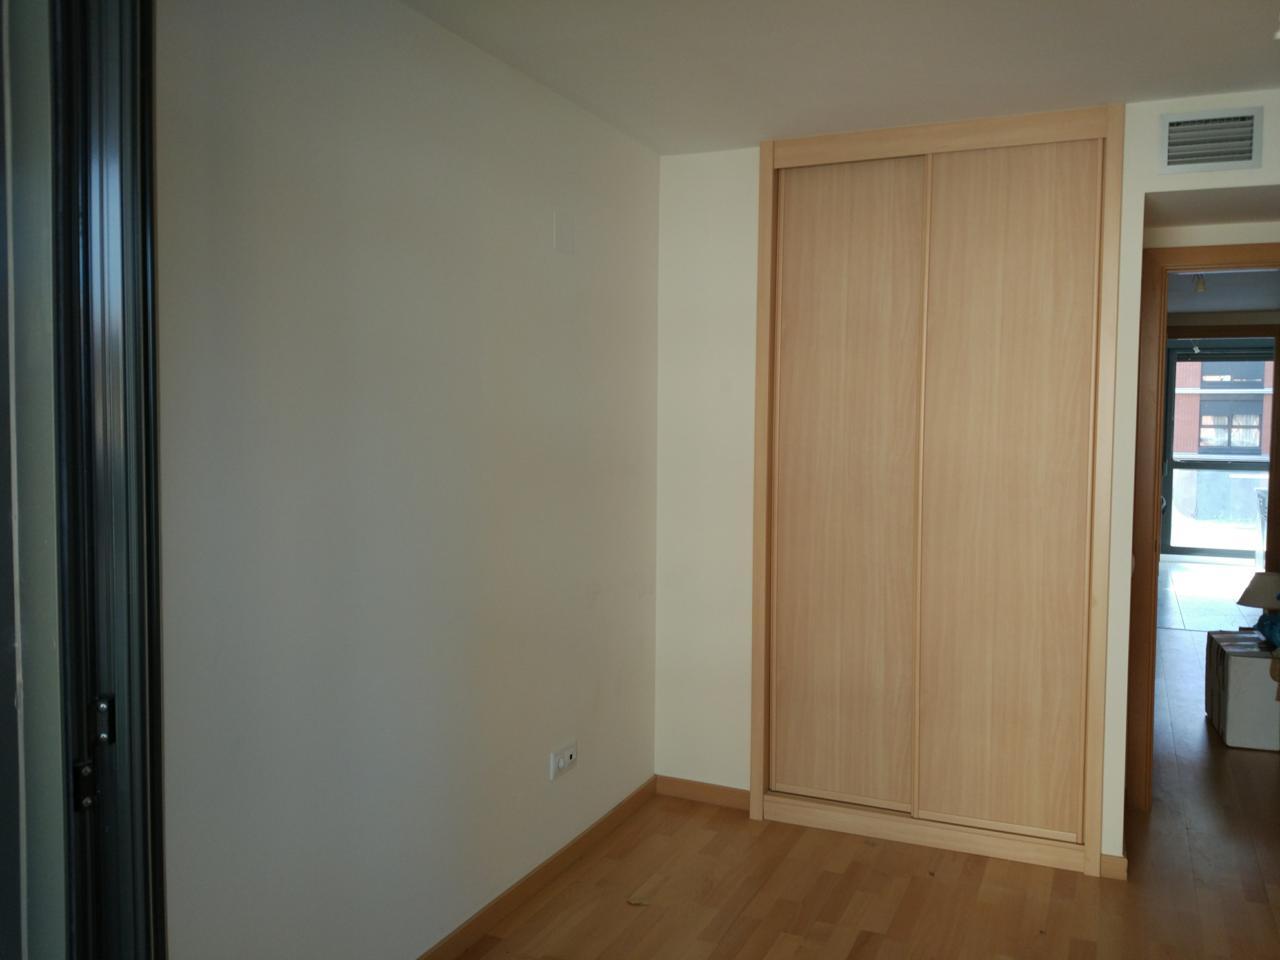 piso inversores con inquilino obra nueva zaragoza|publipisos inmobiliarias-3